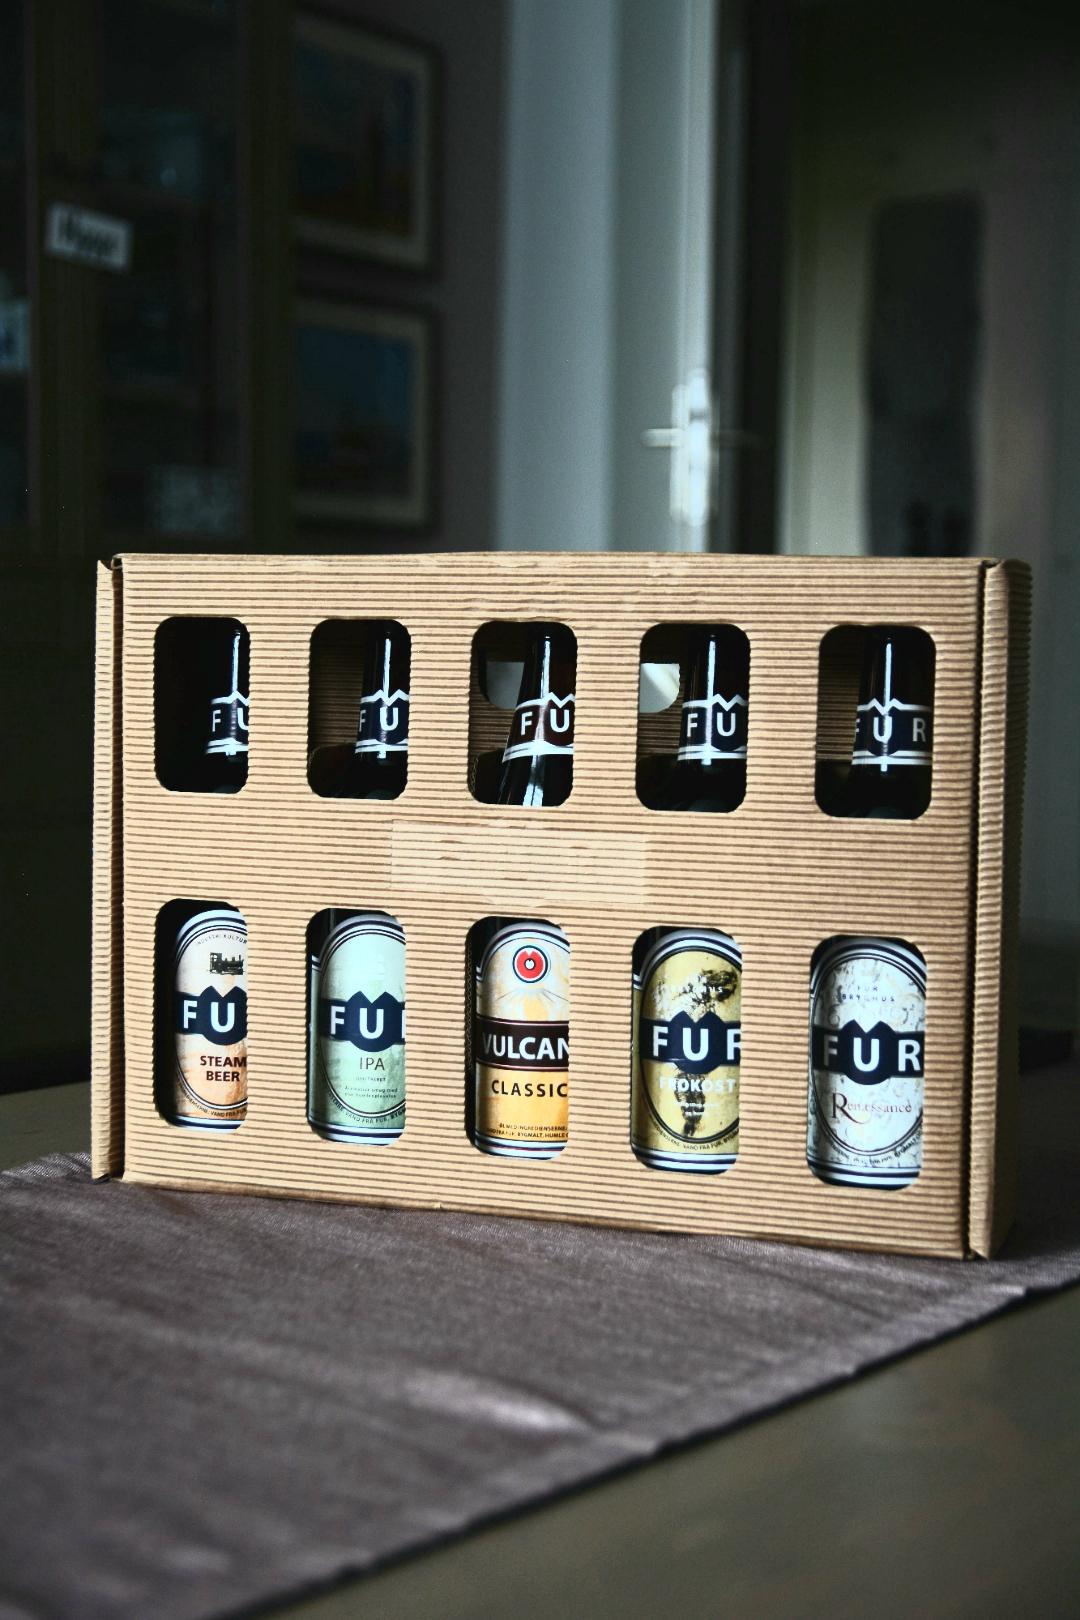 Fur Bier